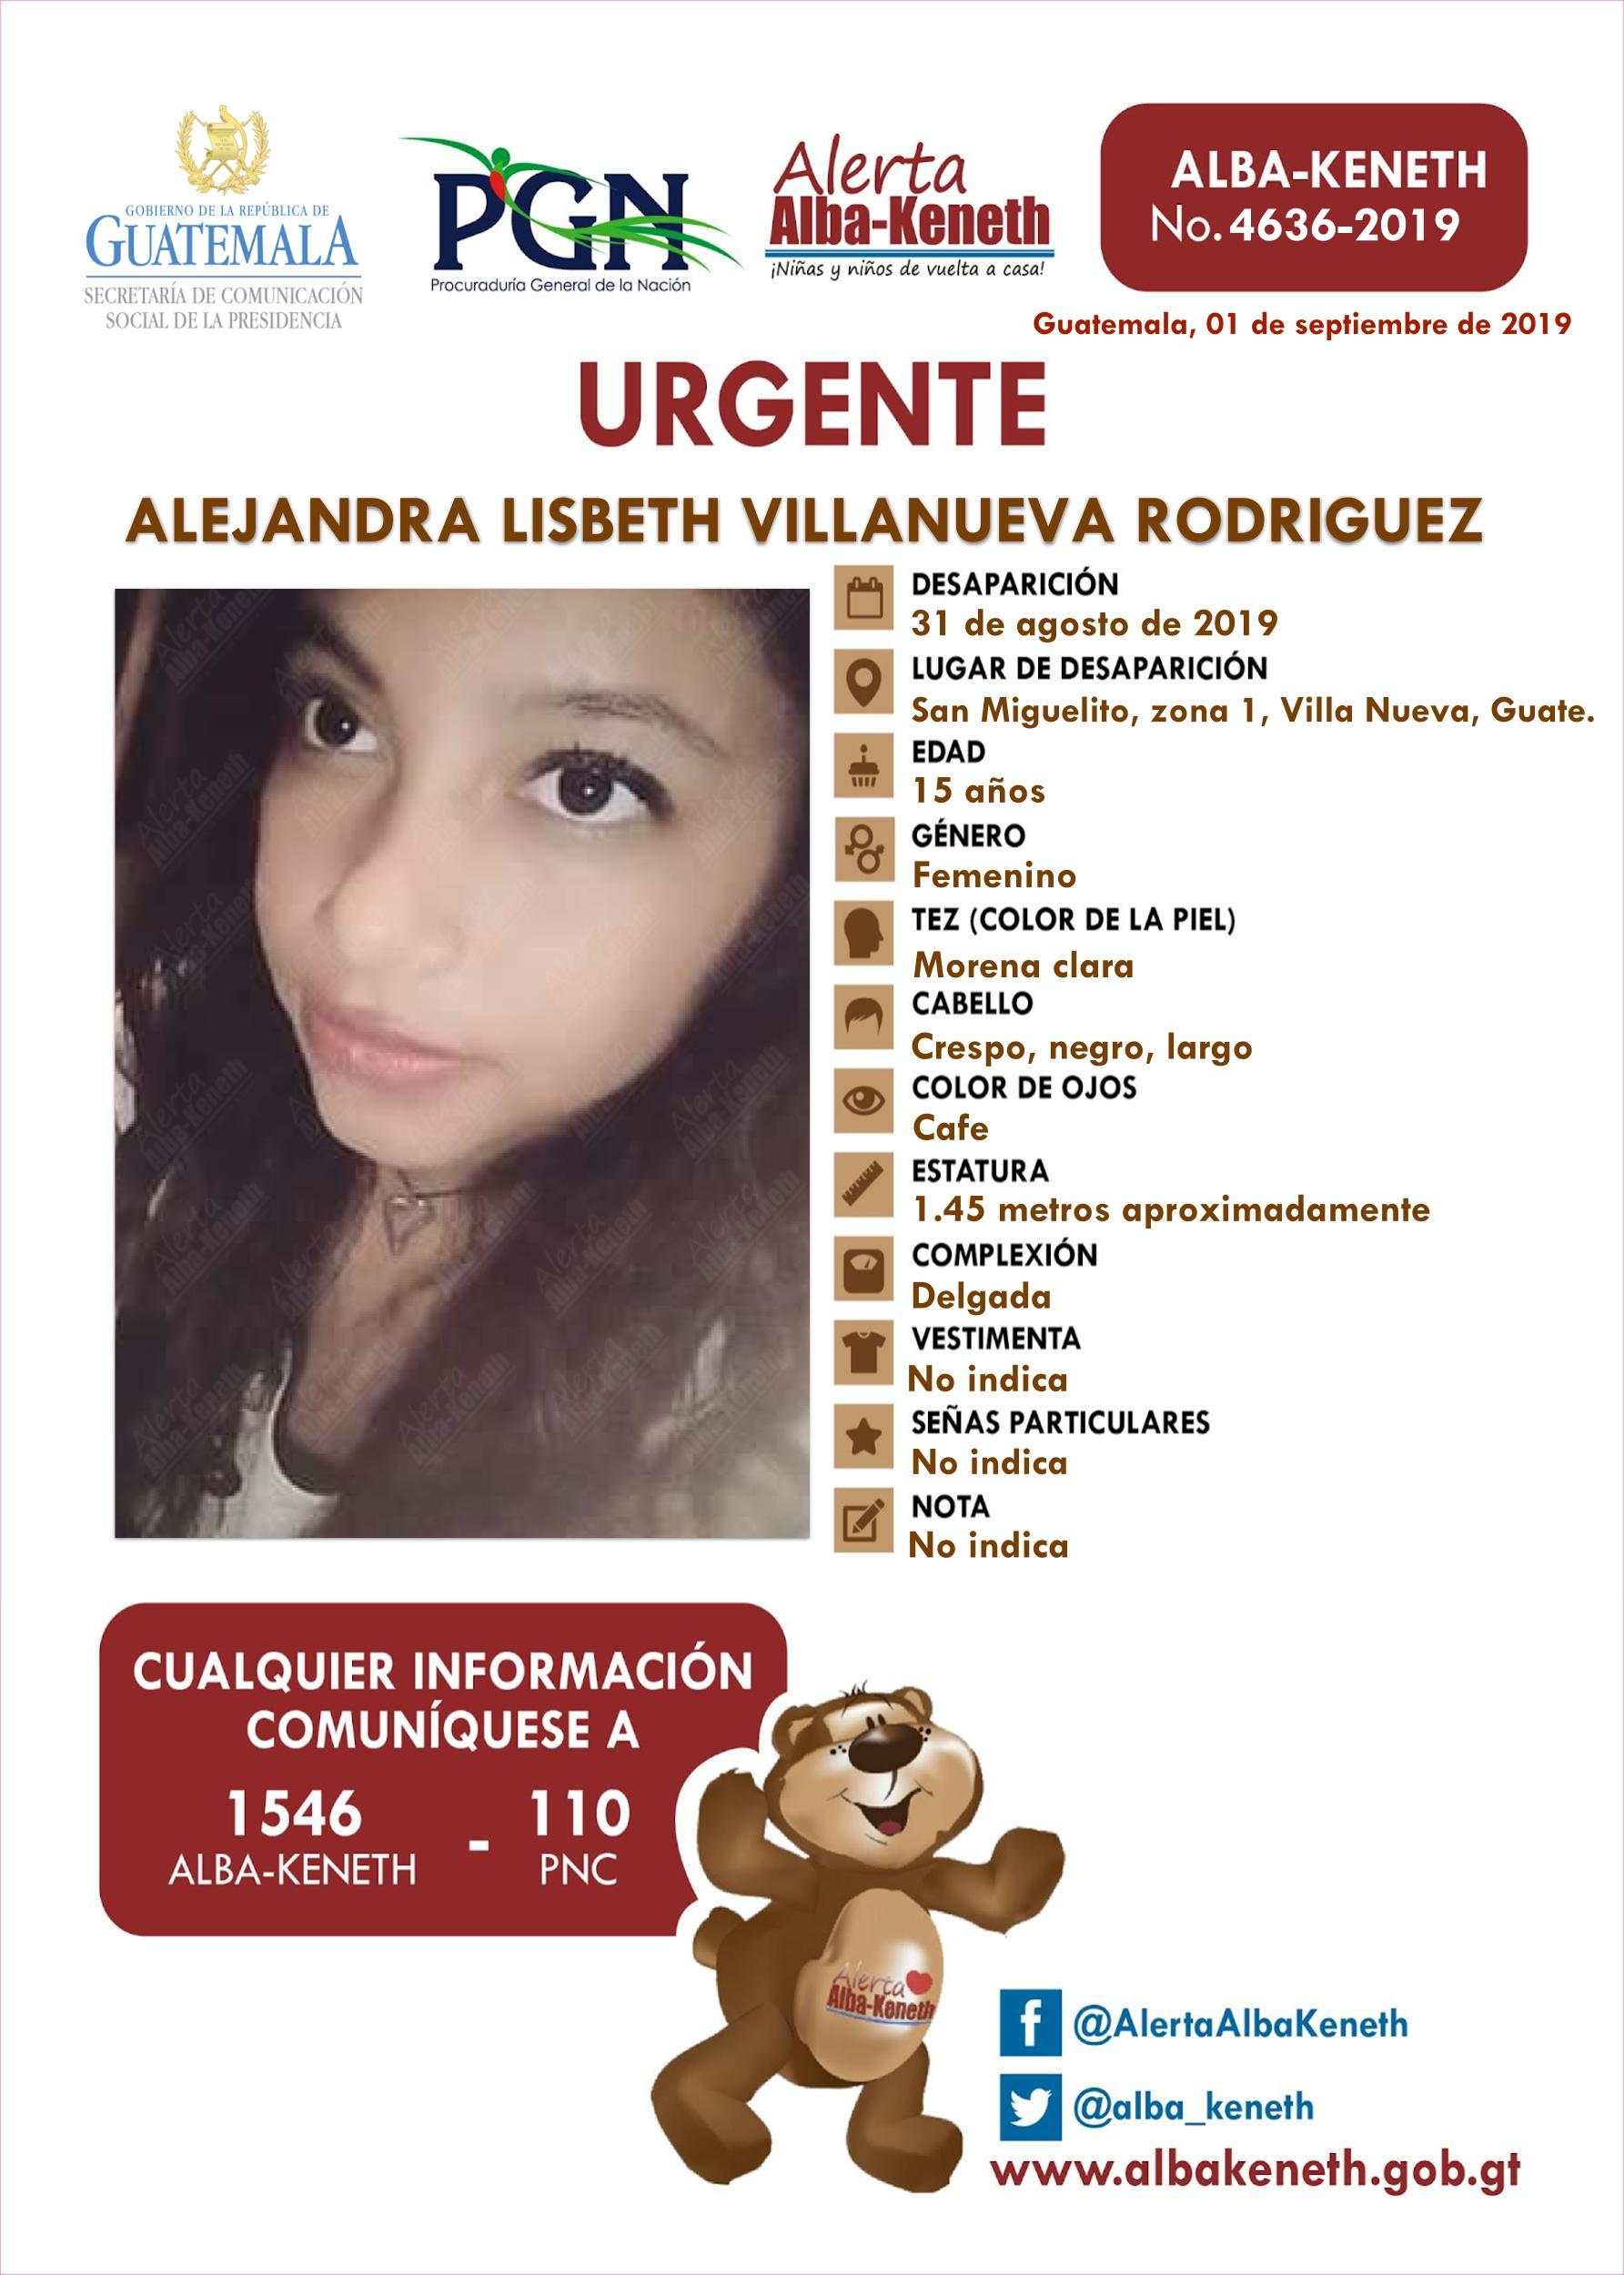 Alejandra Lisbeth Villanueva Rodriguez